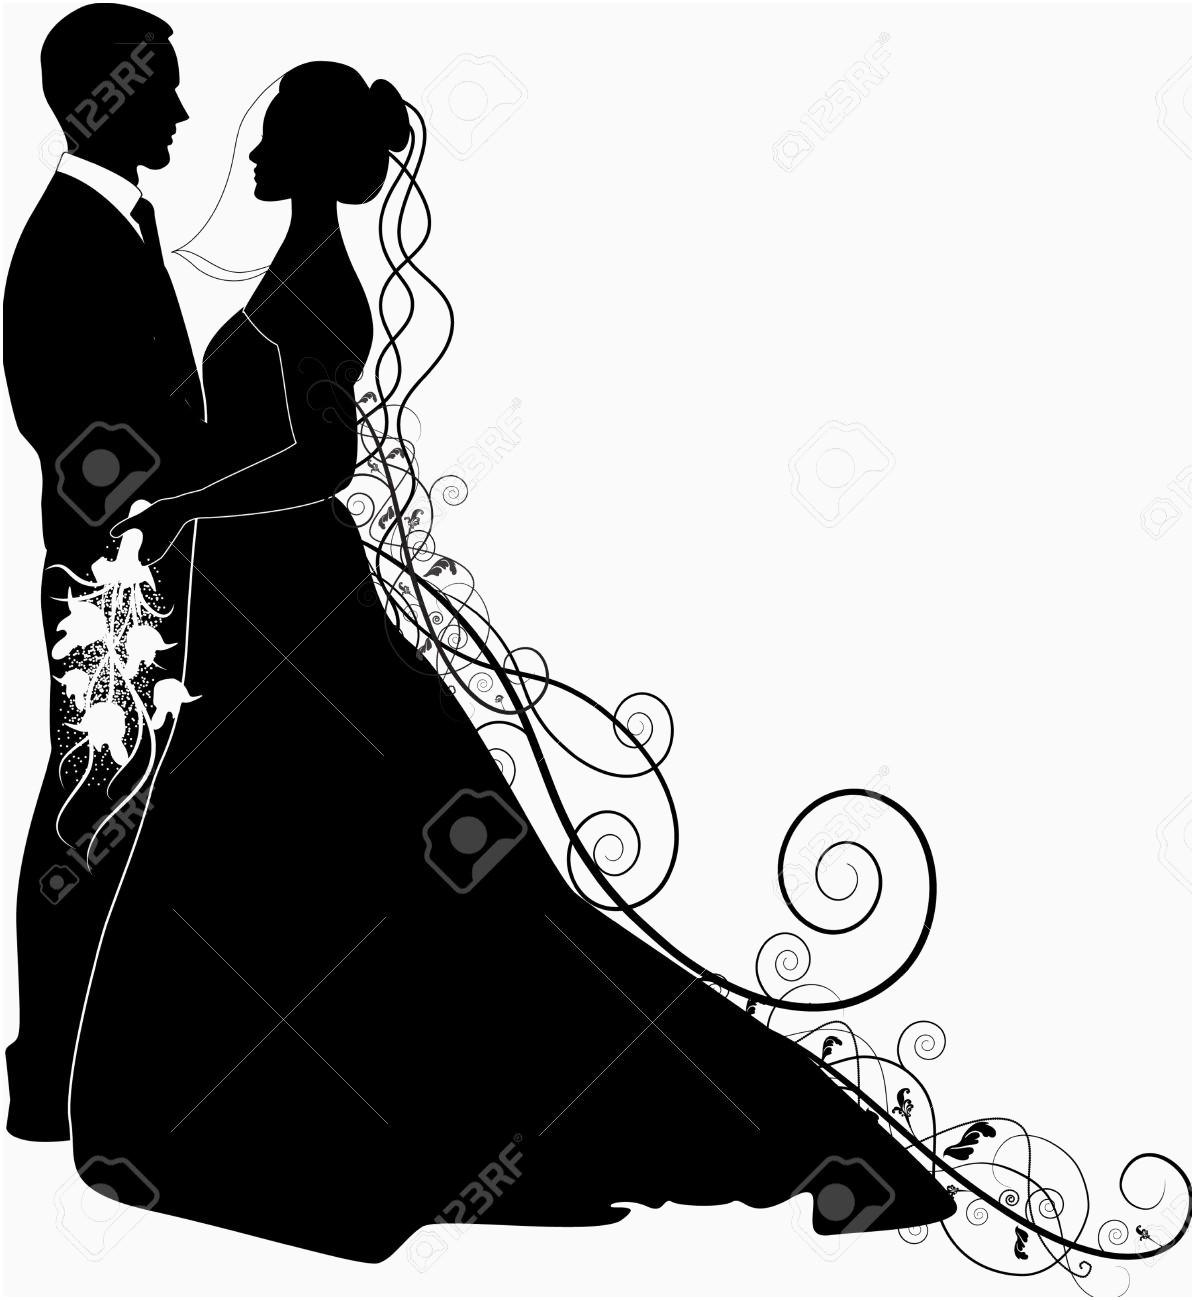 Elegant Wedding Clipart Images.